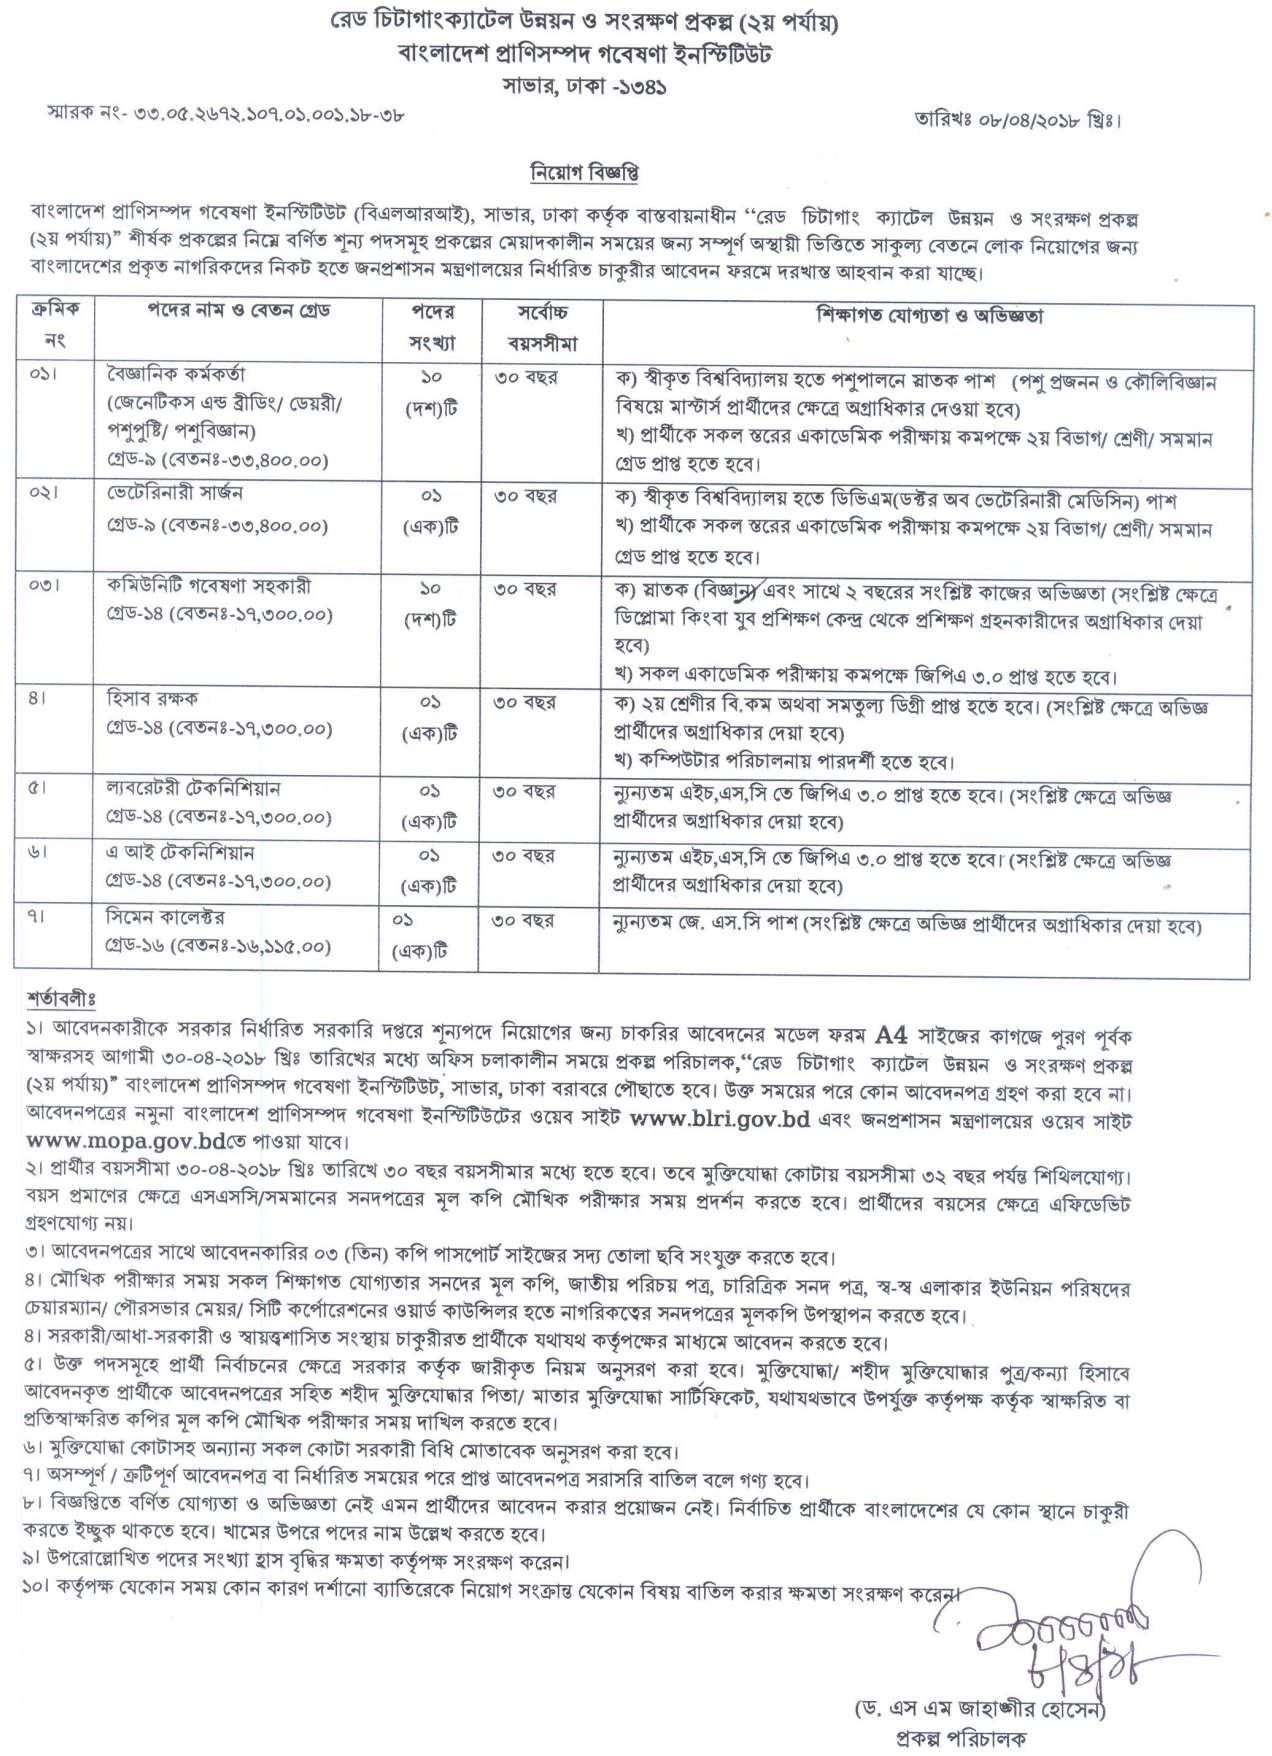 Bangladesh Livestock Research Institute BLRI job circular 2018